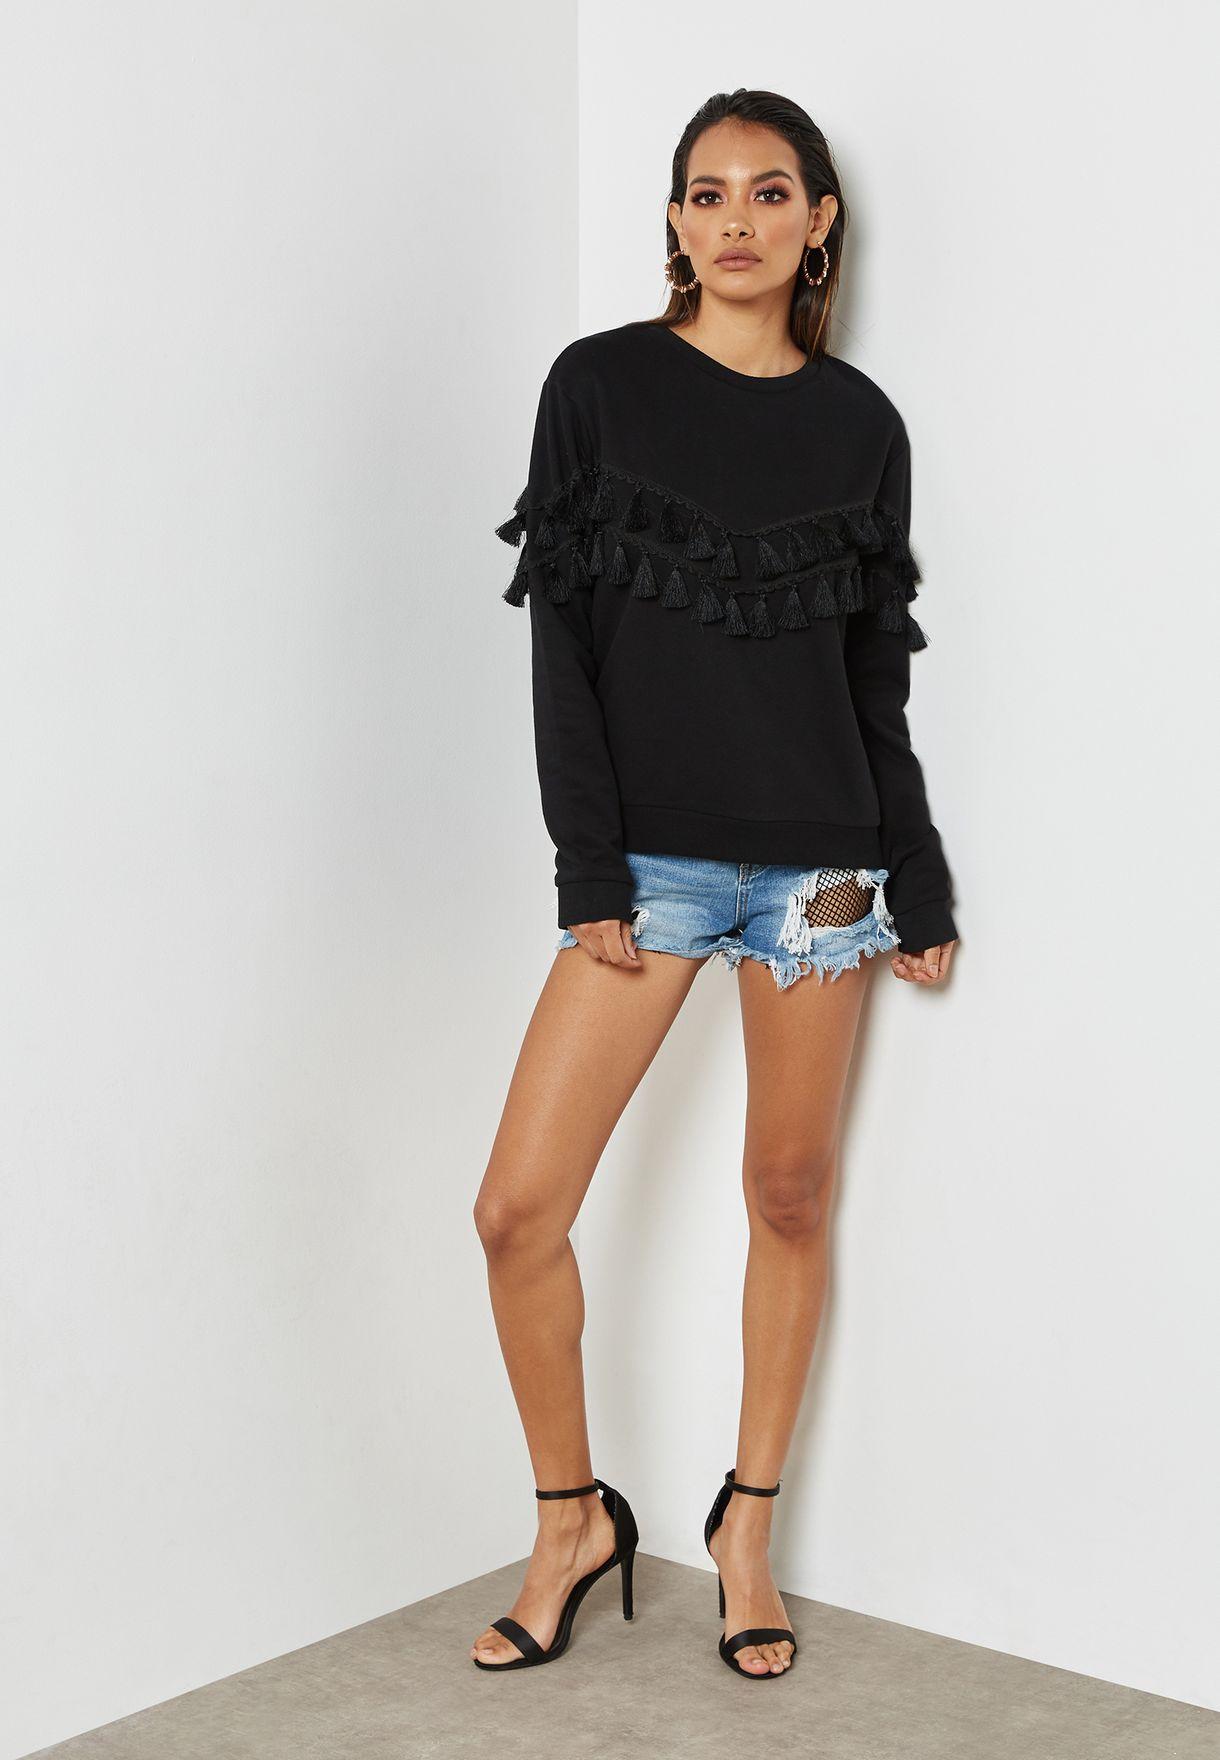 Tassel Trim Oversized Sweatshirt